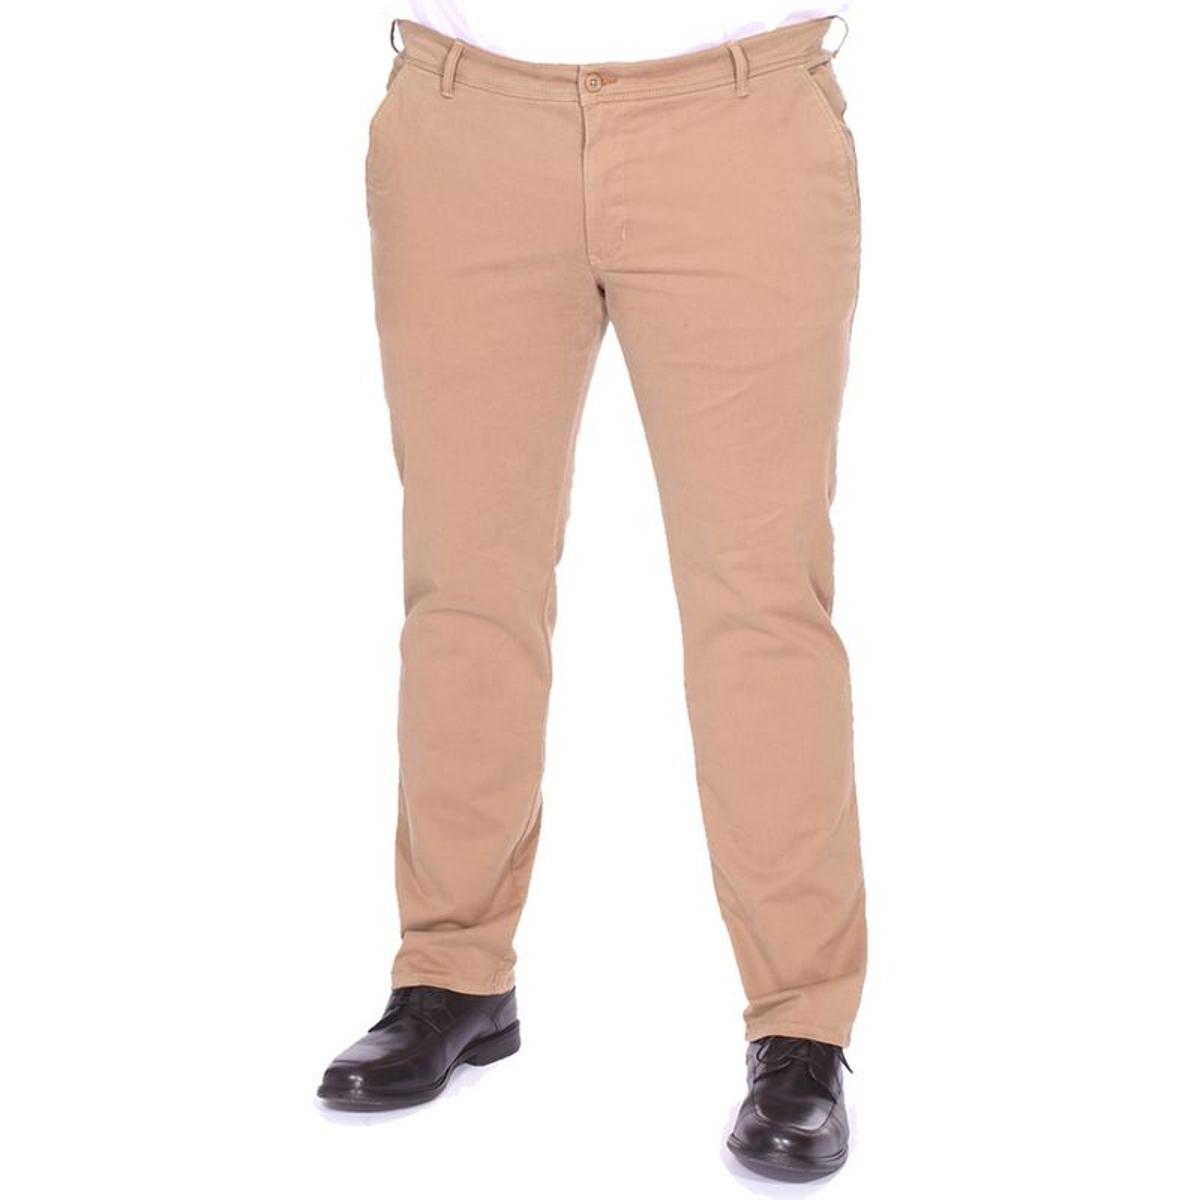 Pantalon Coton, Elasthane